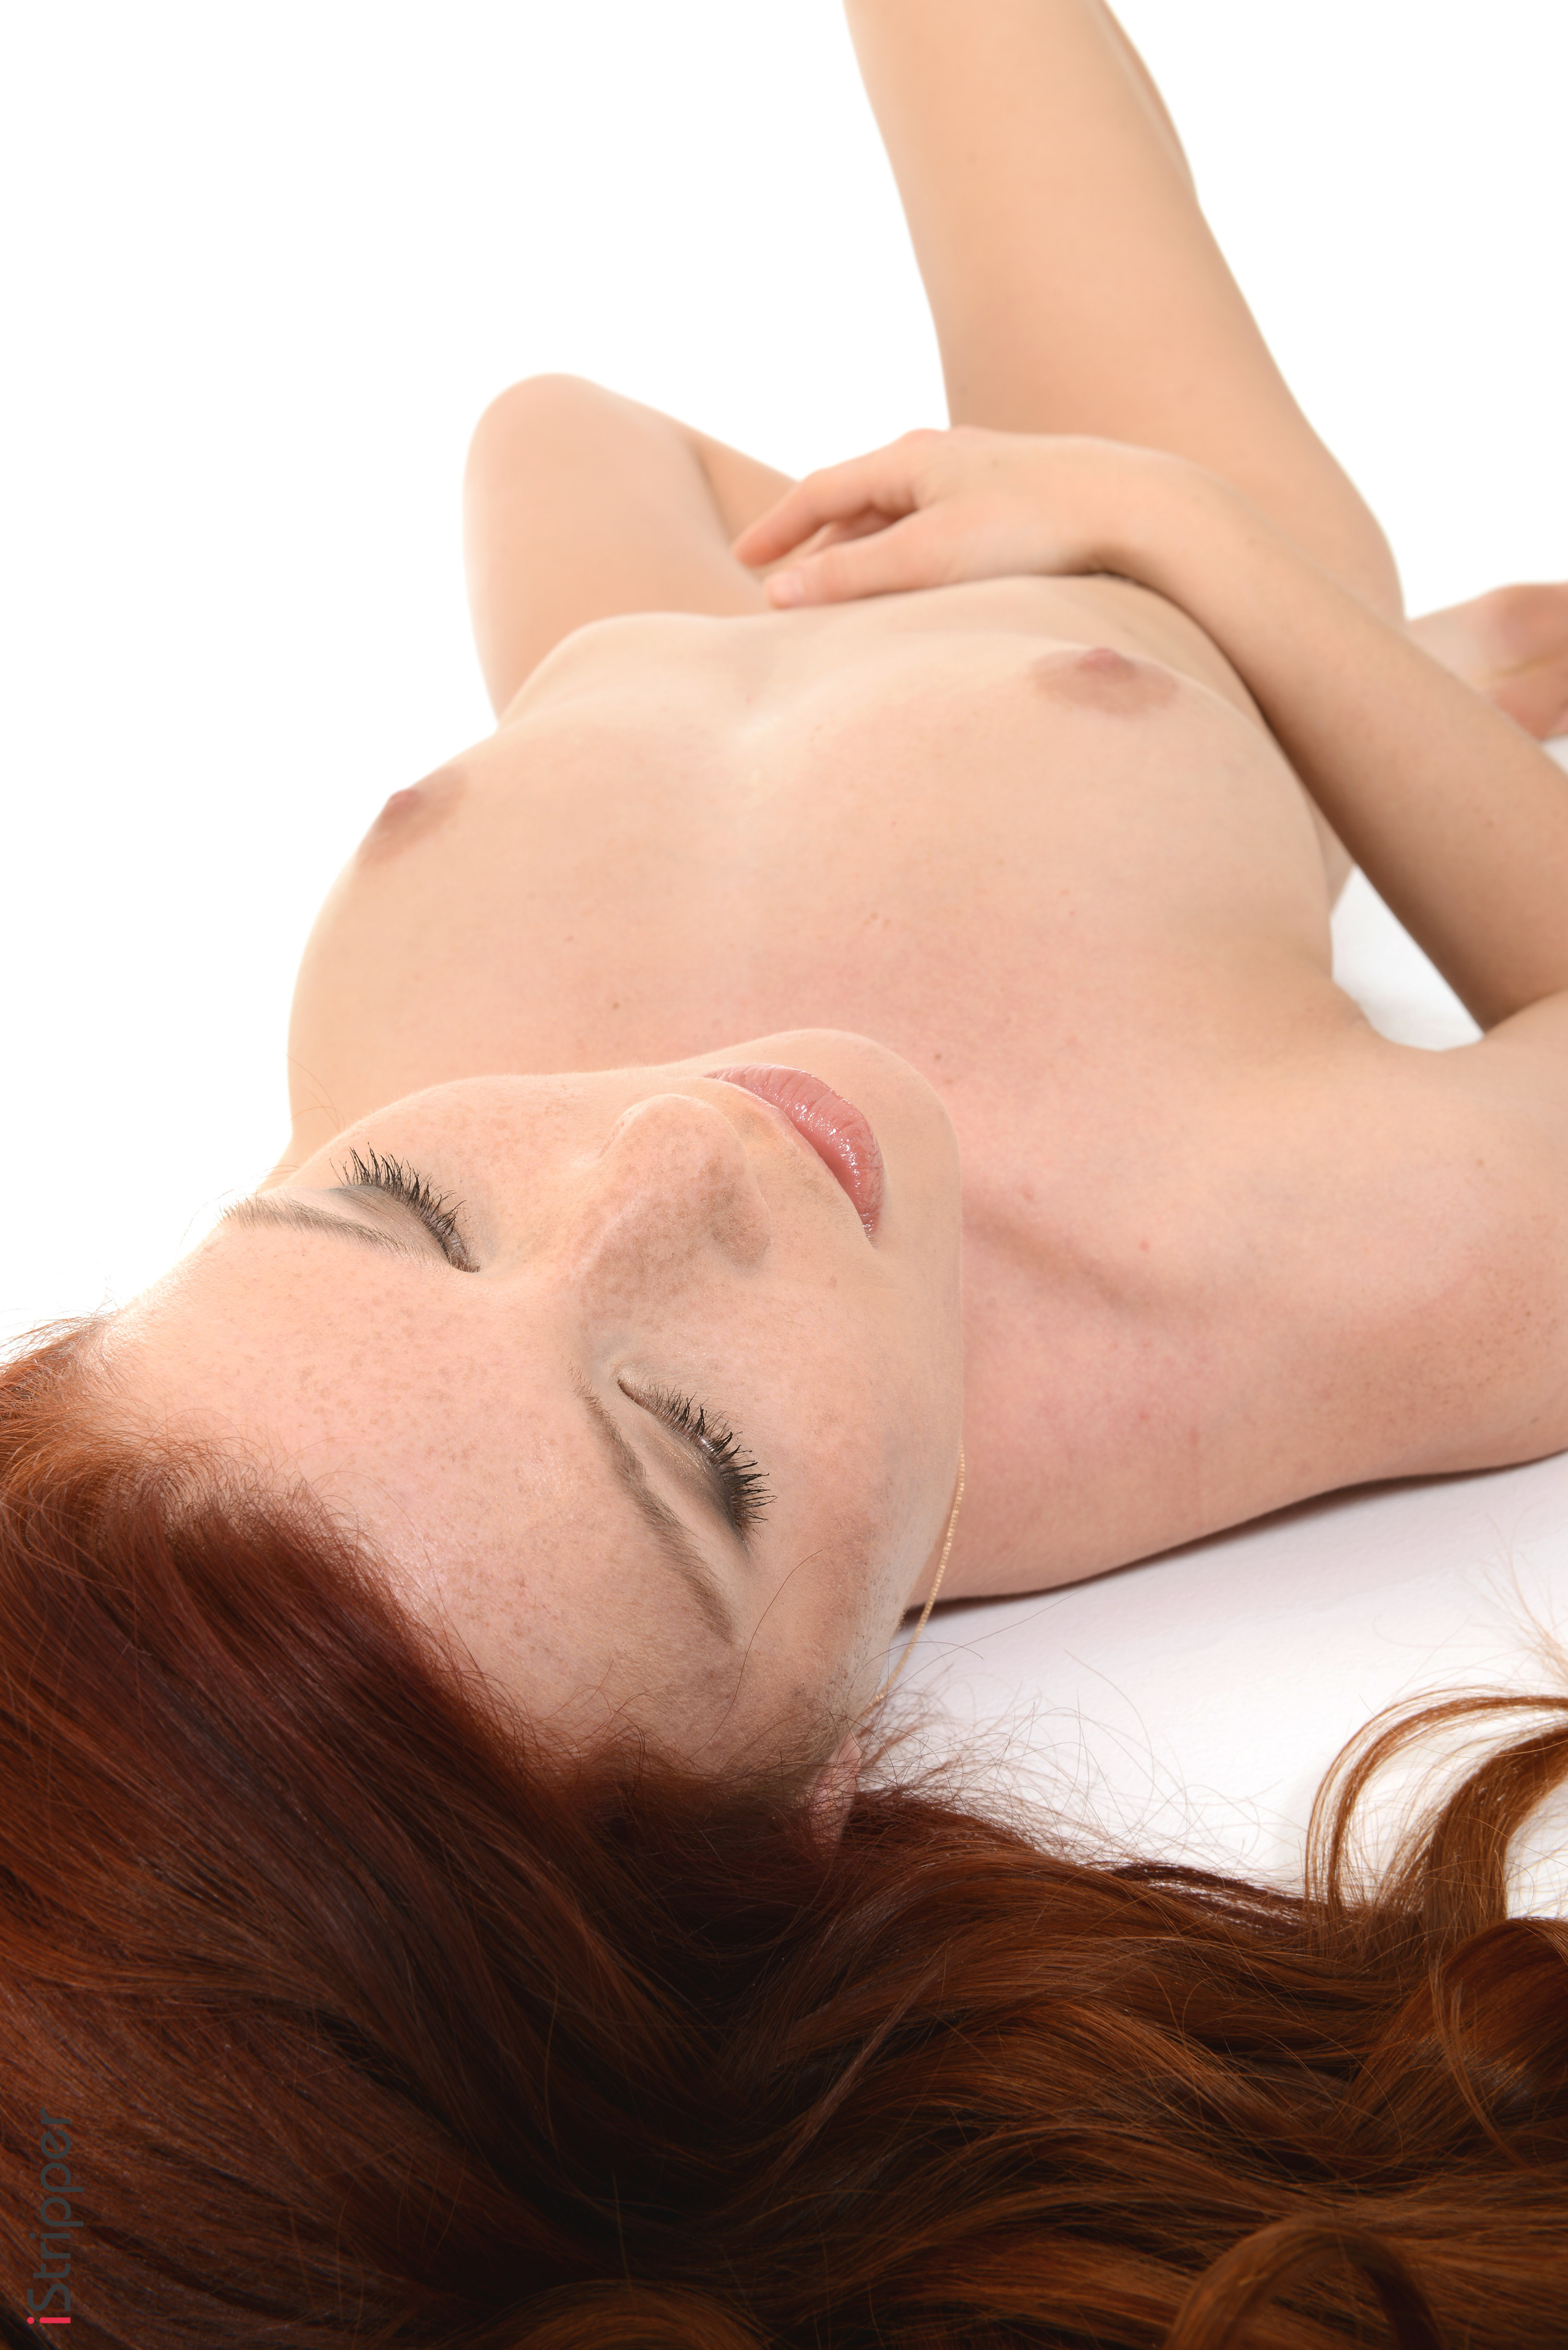 erotic nude art wallpaper yaoi